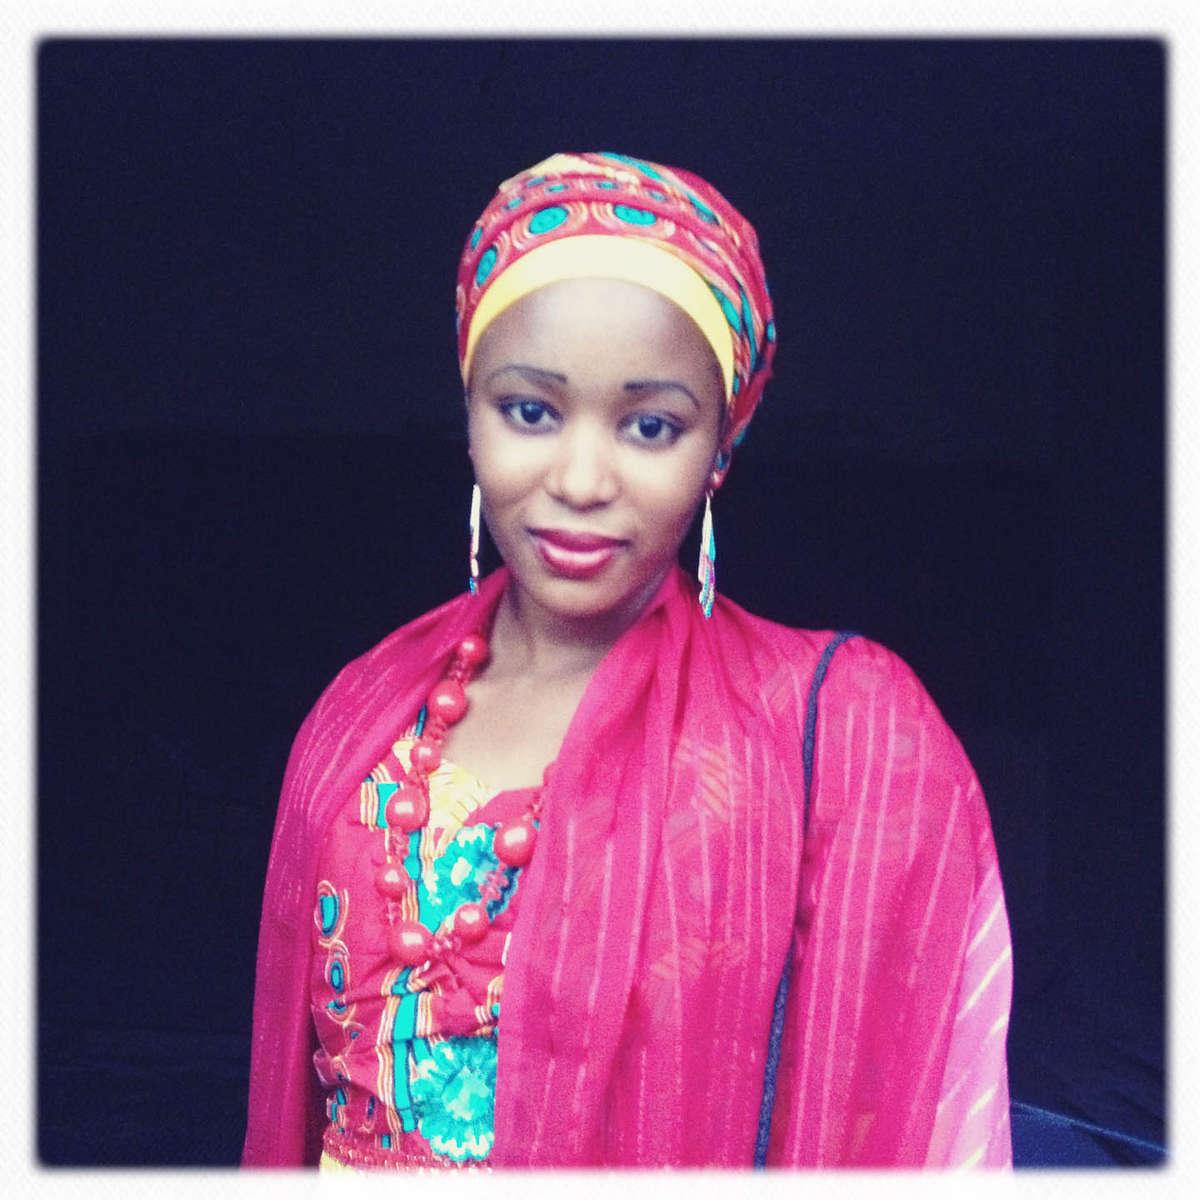 Wedding guest in Kano, Northern Nigeria. April 2013.